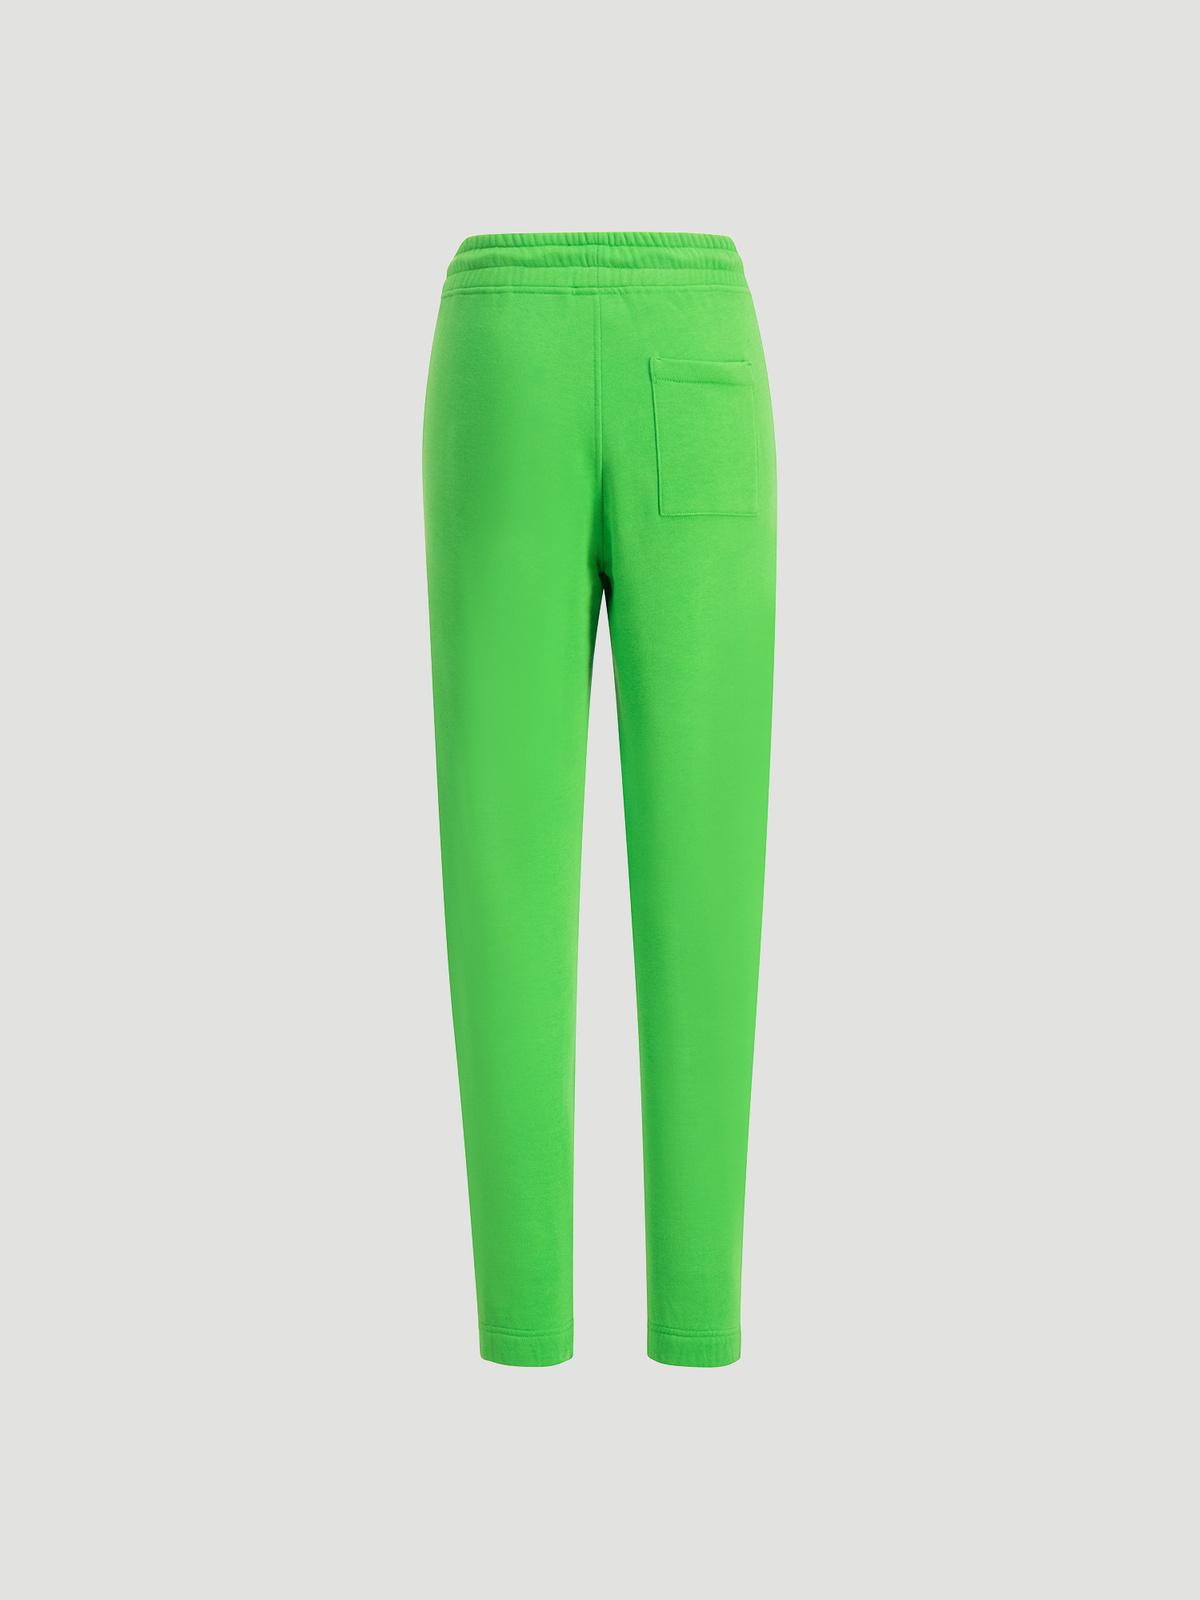 Hanger Trousers Green 1